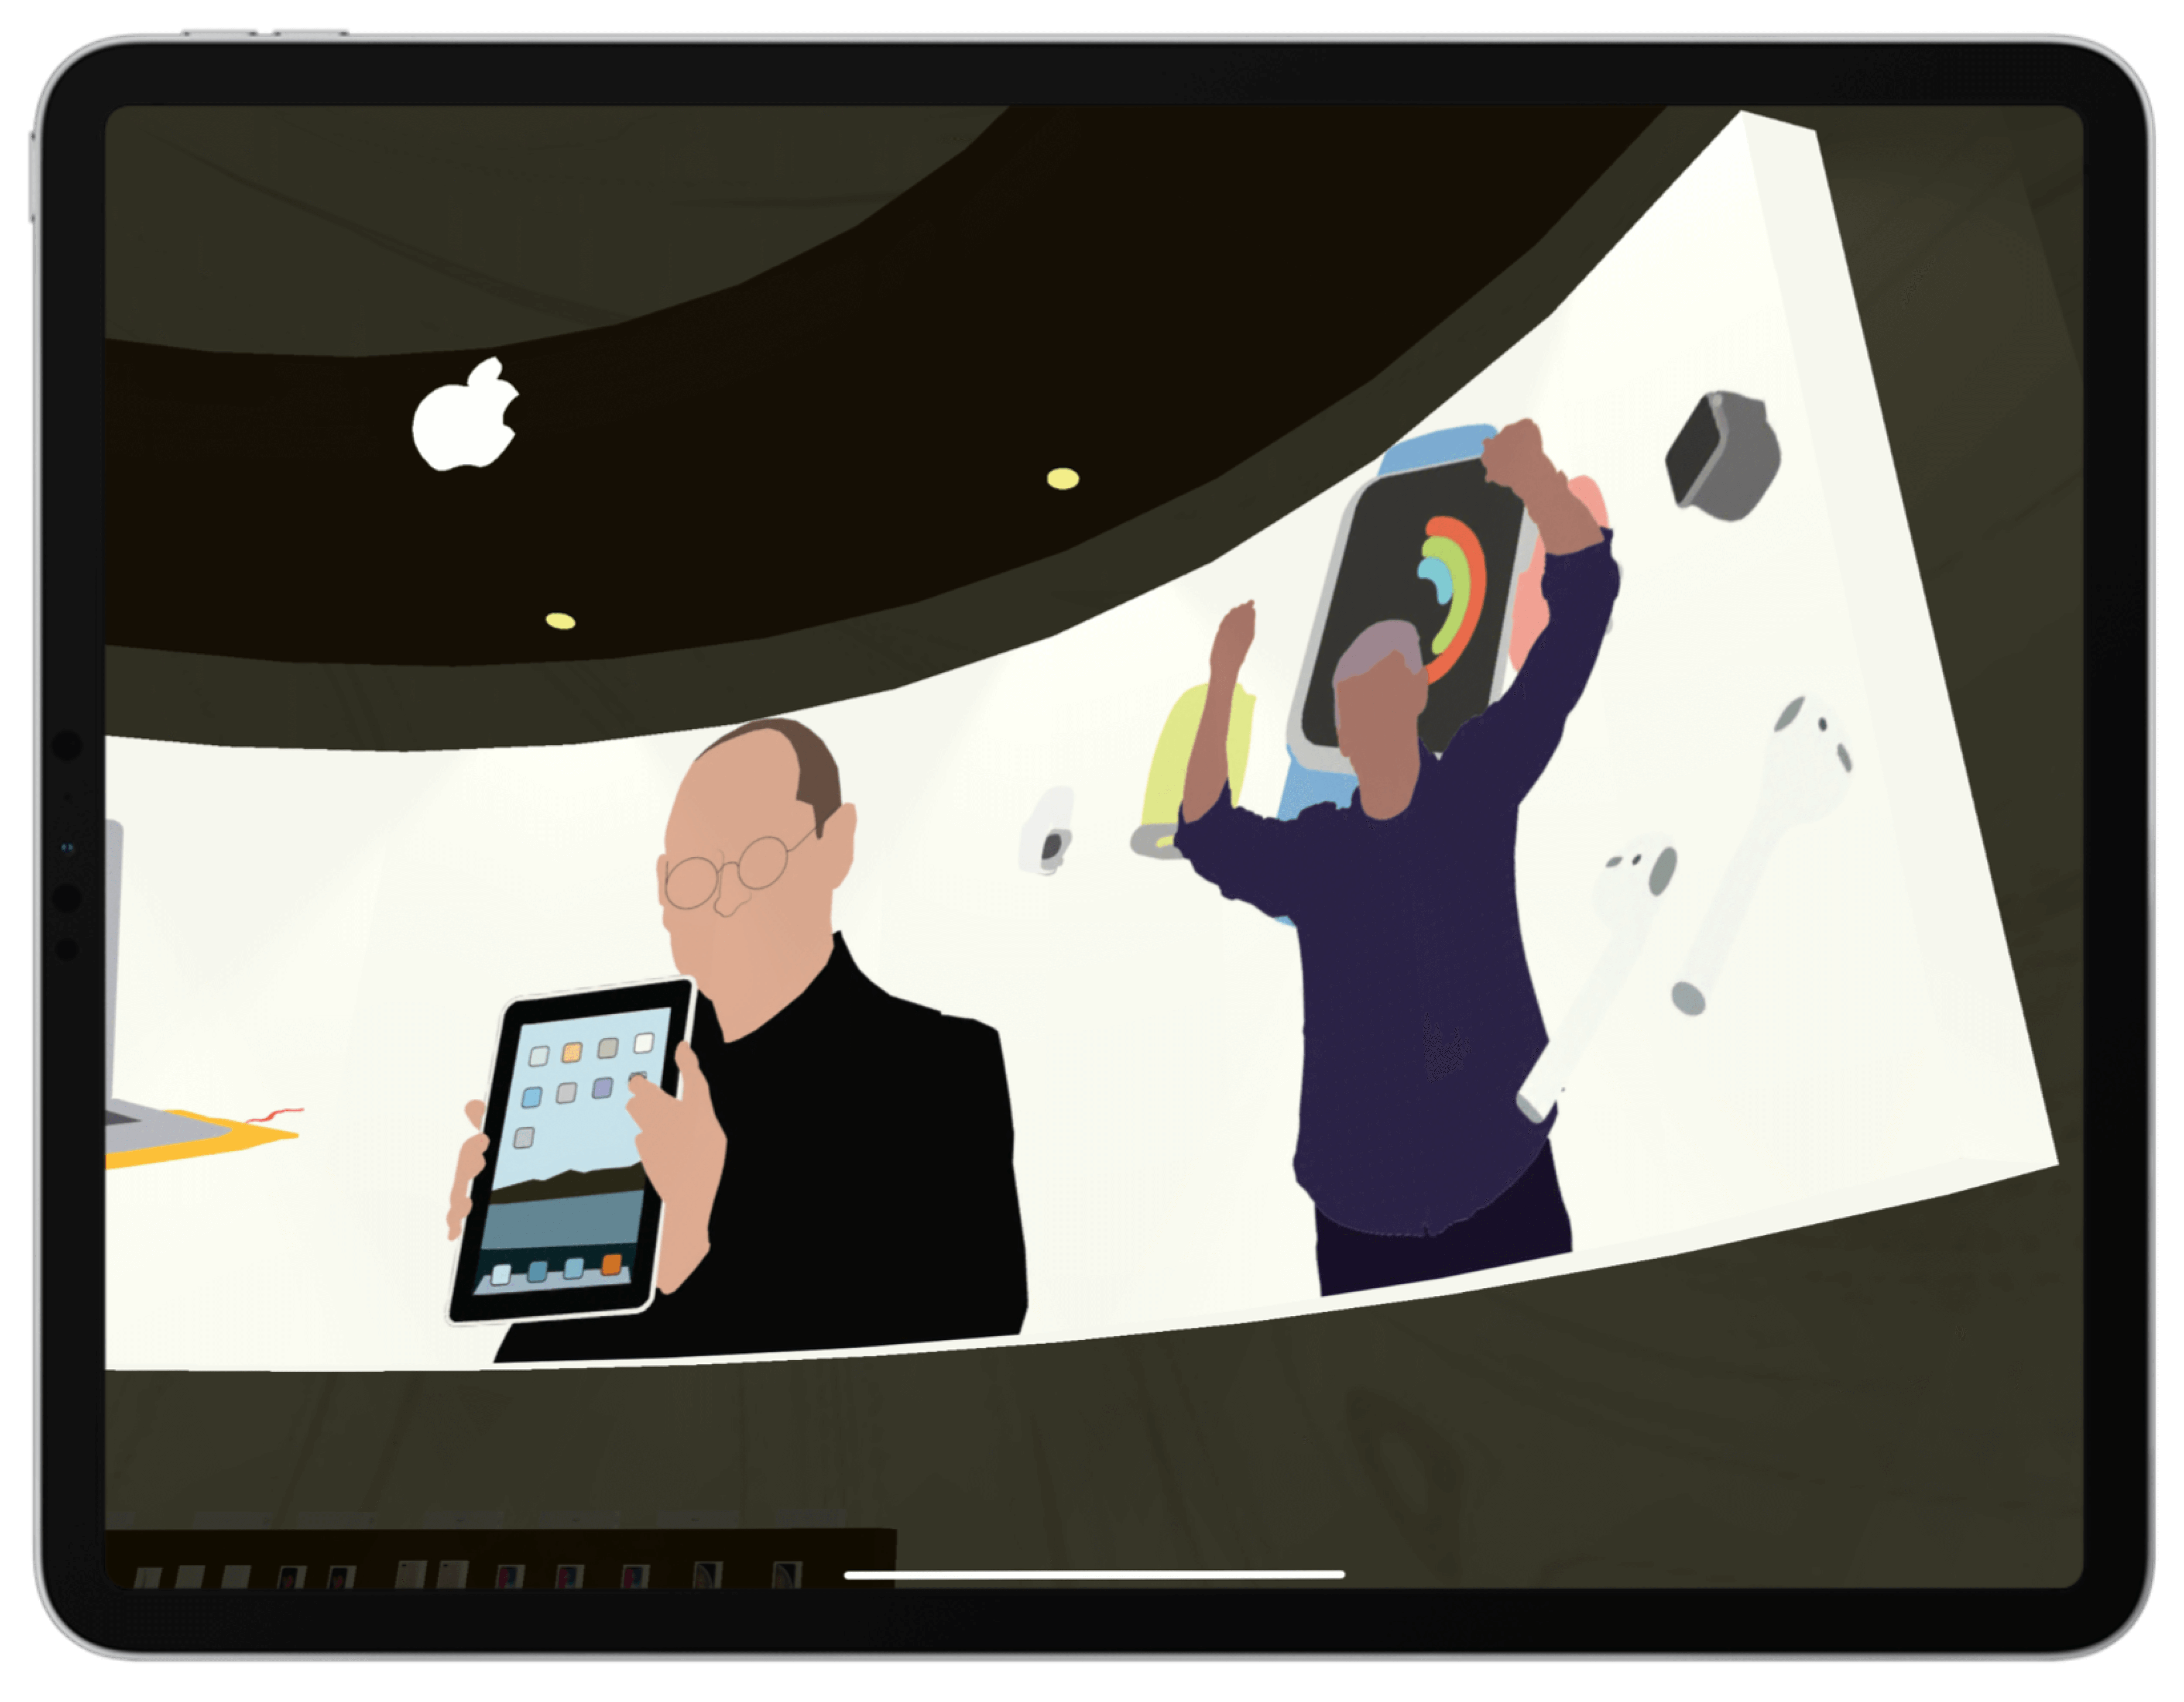 Apple Chapel Mural Screenshot | Toby Everett